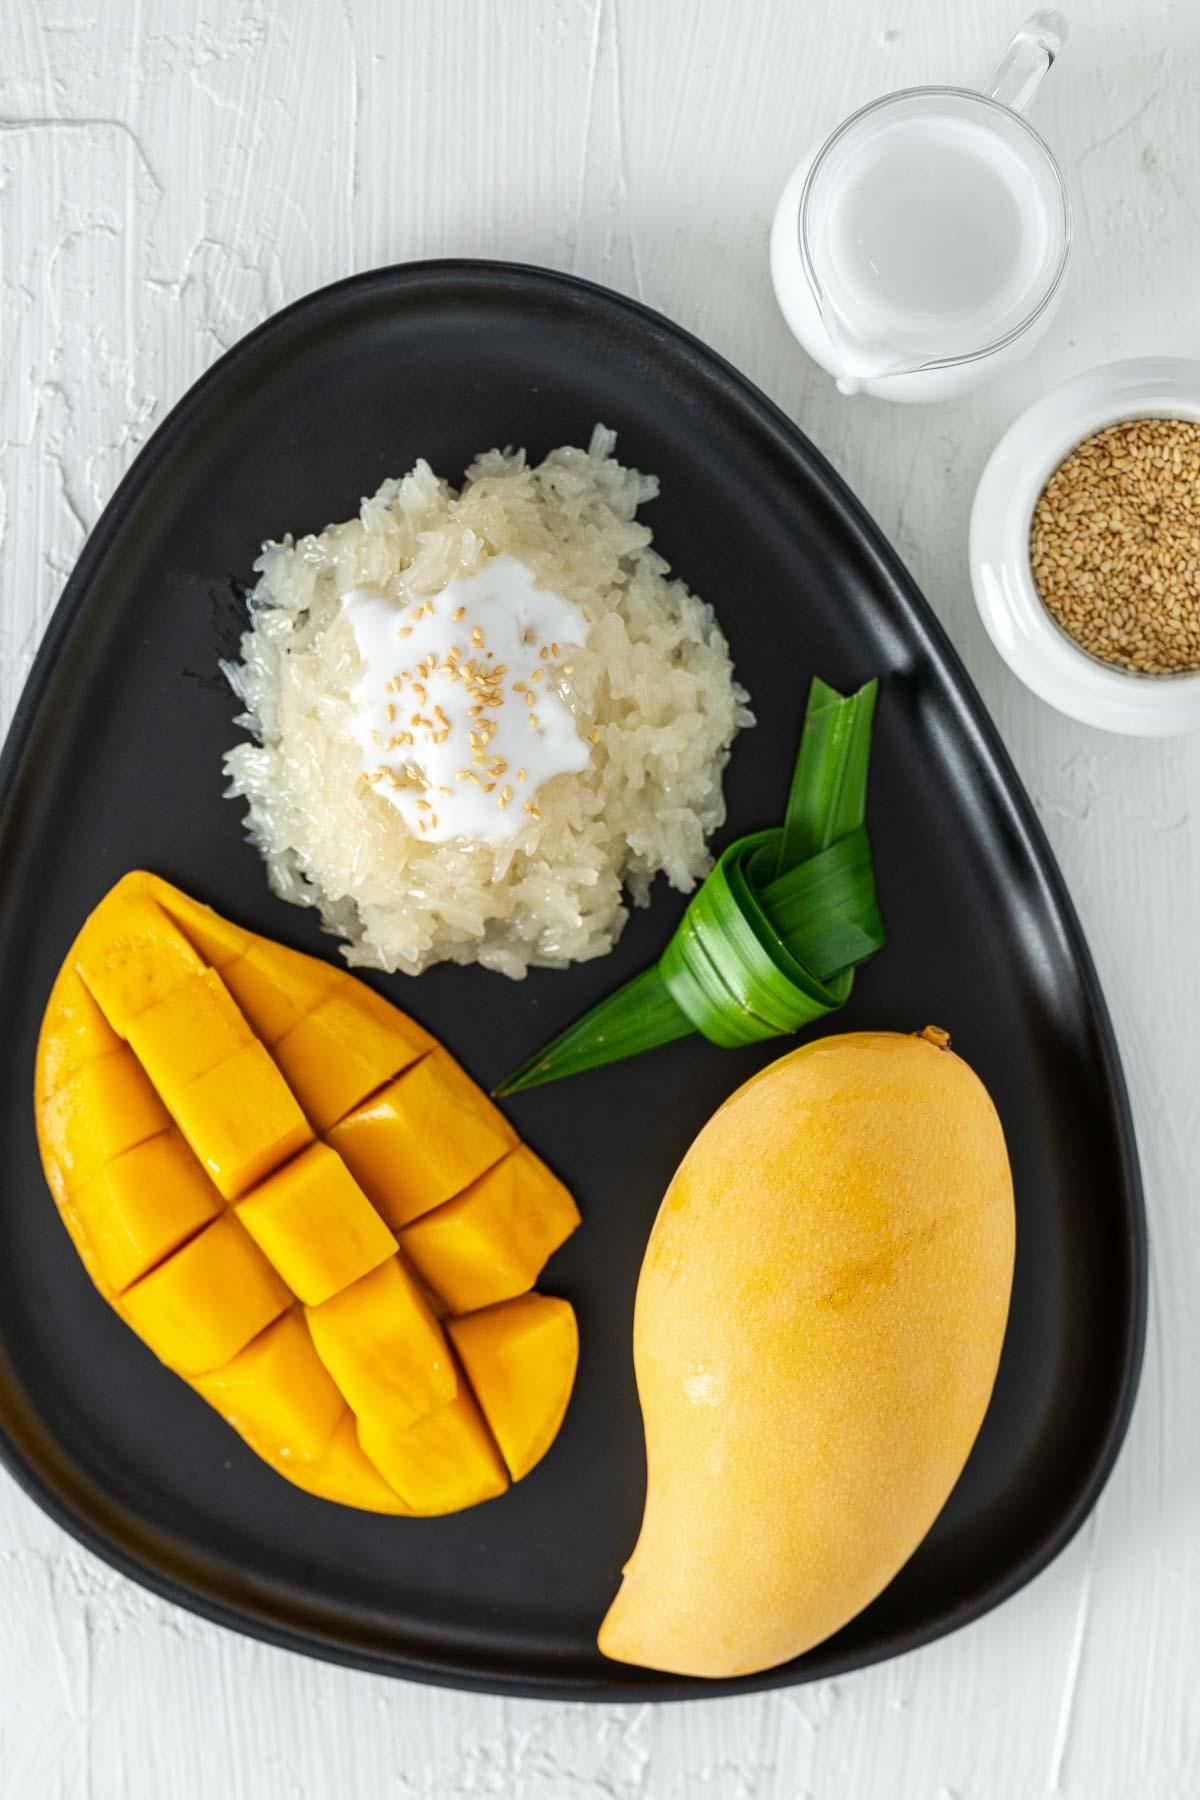 Thai mango sticky rice dessert with pandan leaves on a black plate